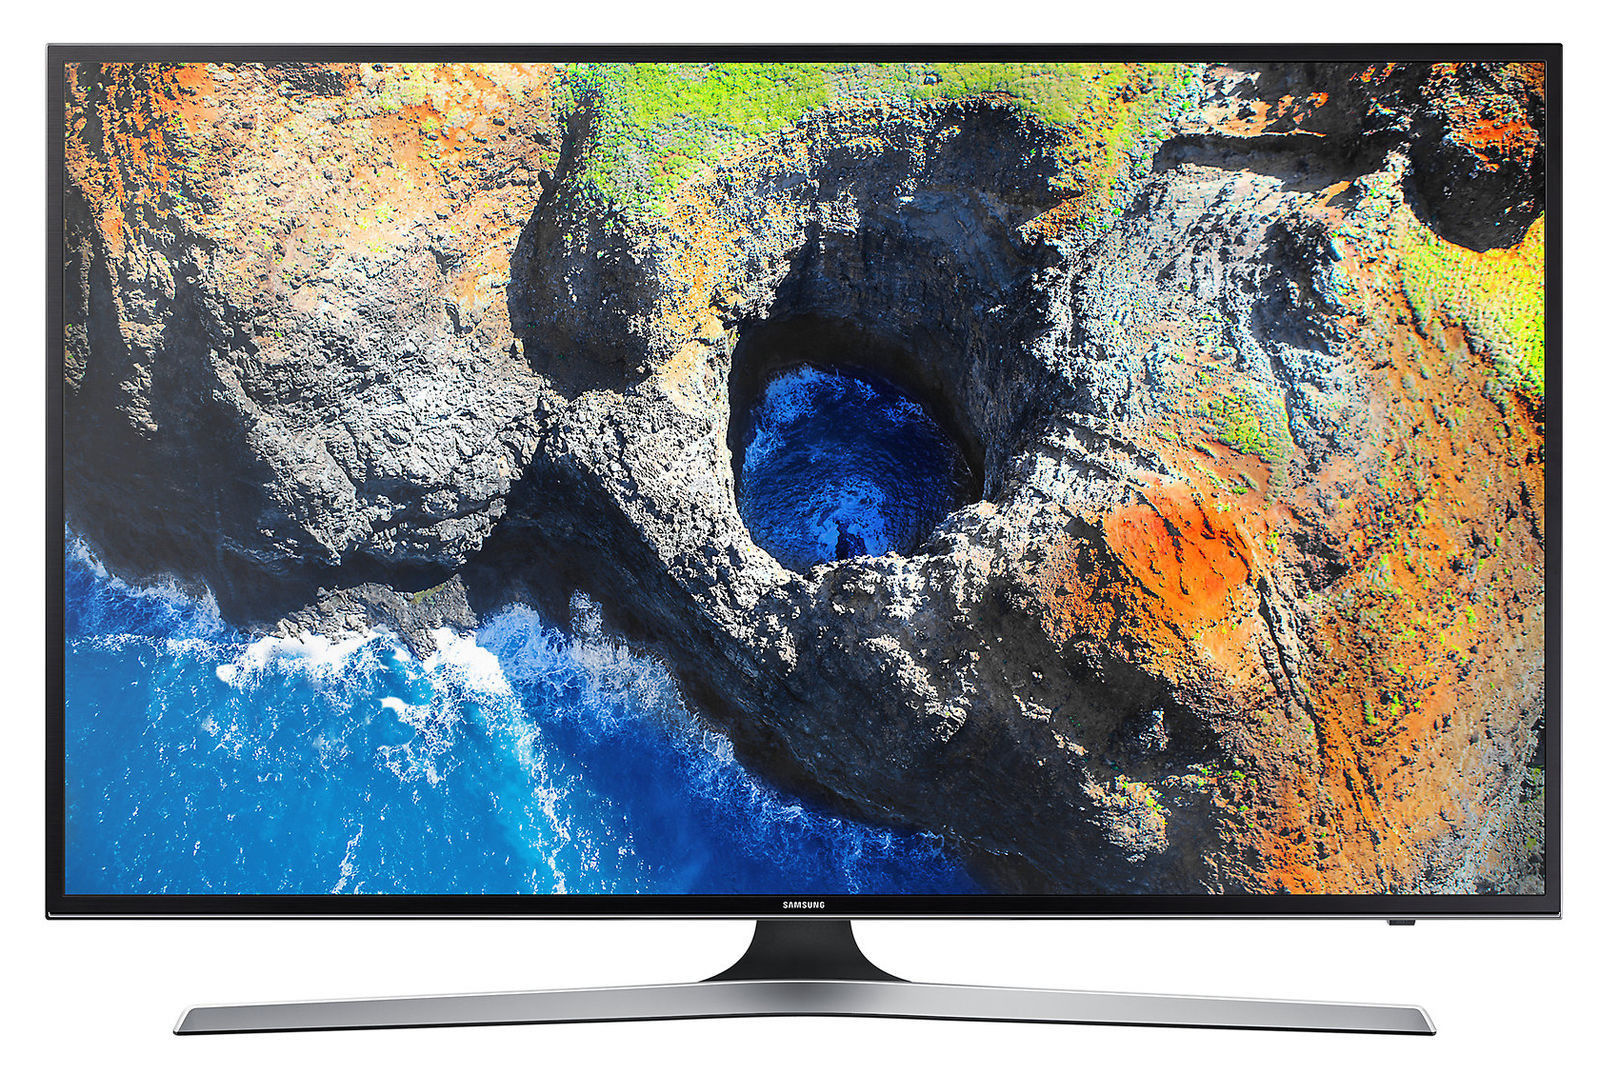 Samsung UE65MU6179UXZG Smart-TV 163cm 65 Zoll LED4K UHD 1300PQI  A DVB-T2/C/S2